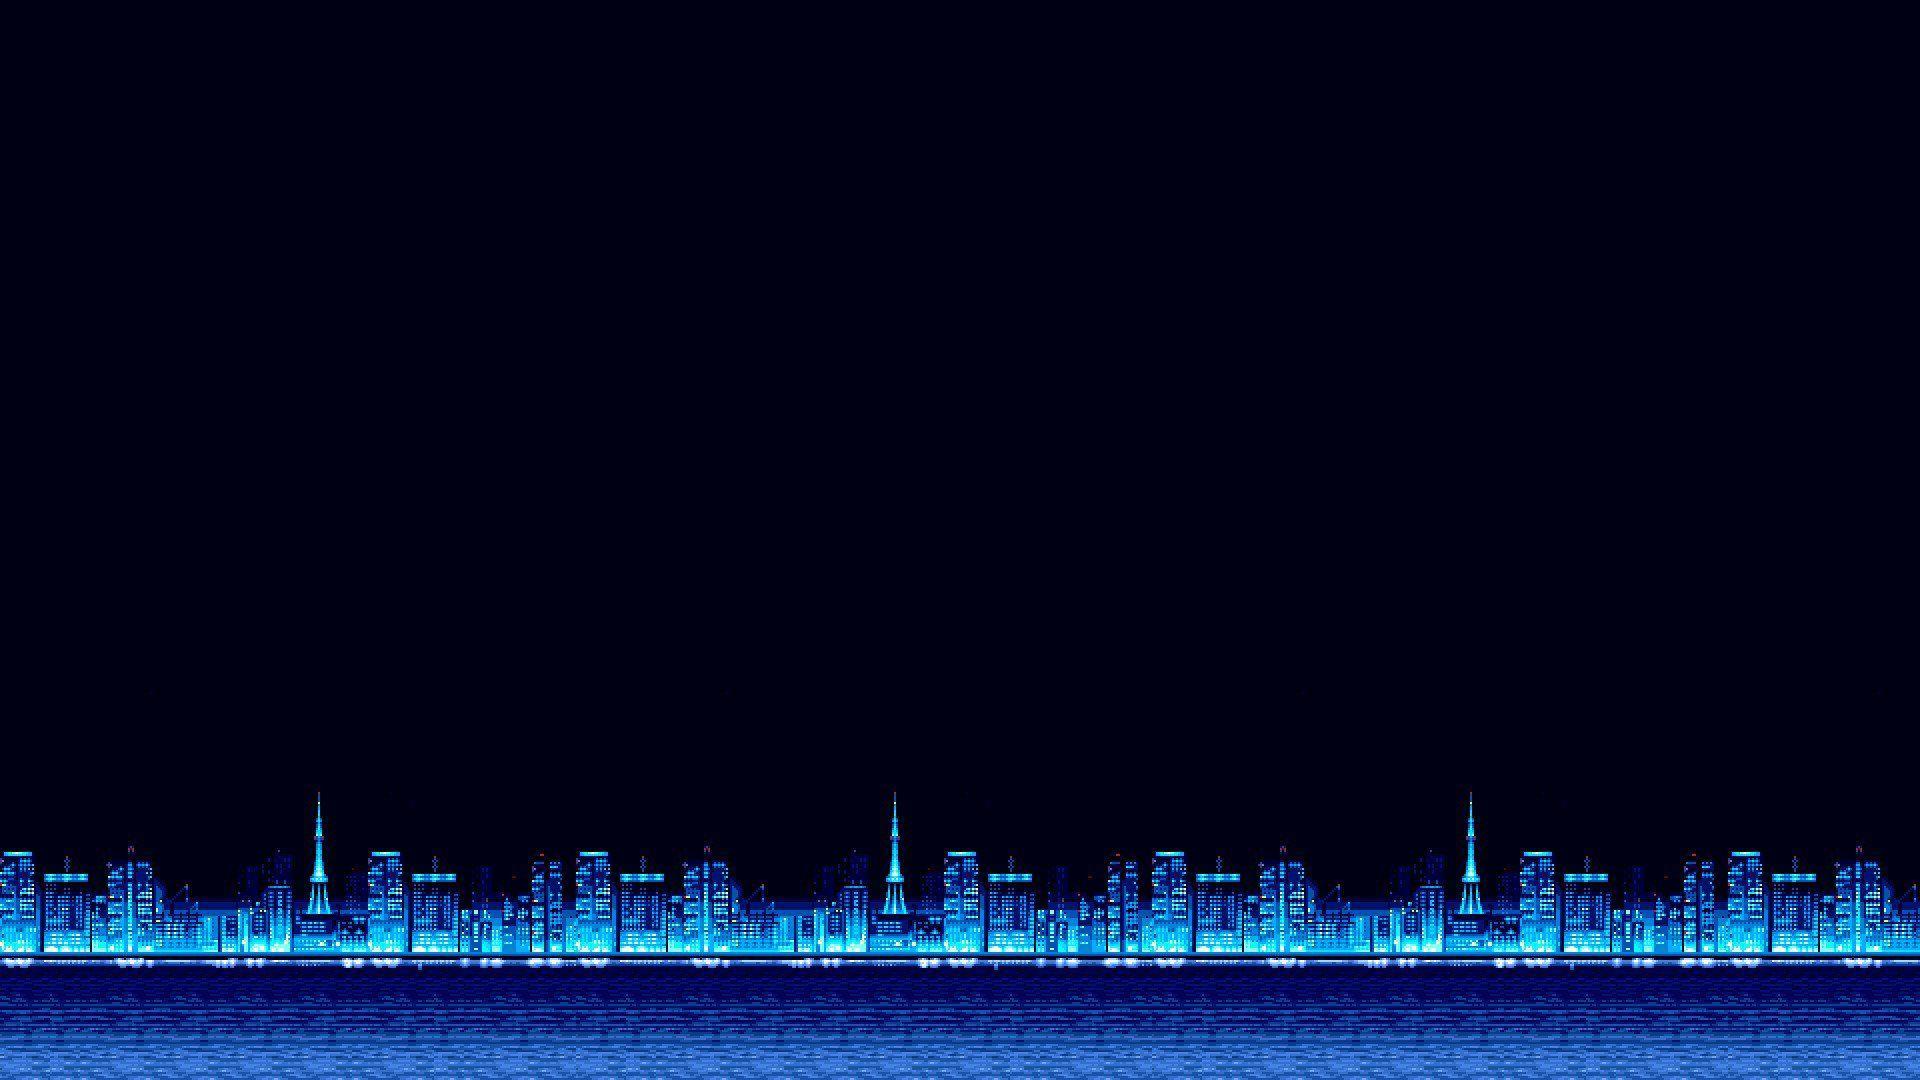 8 Bit Wallpapers Top Free 8 Bit Backgrounds Wallpaperaccess